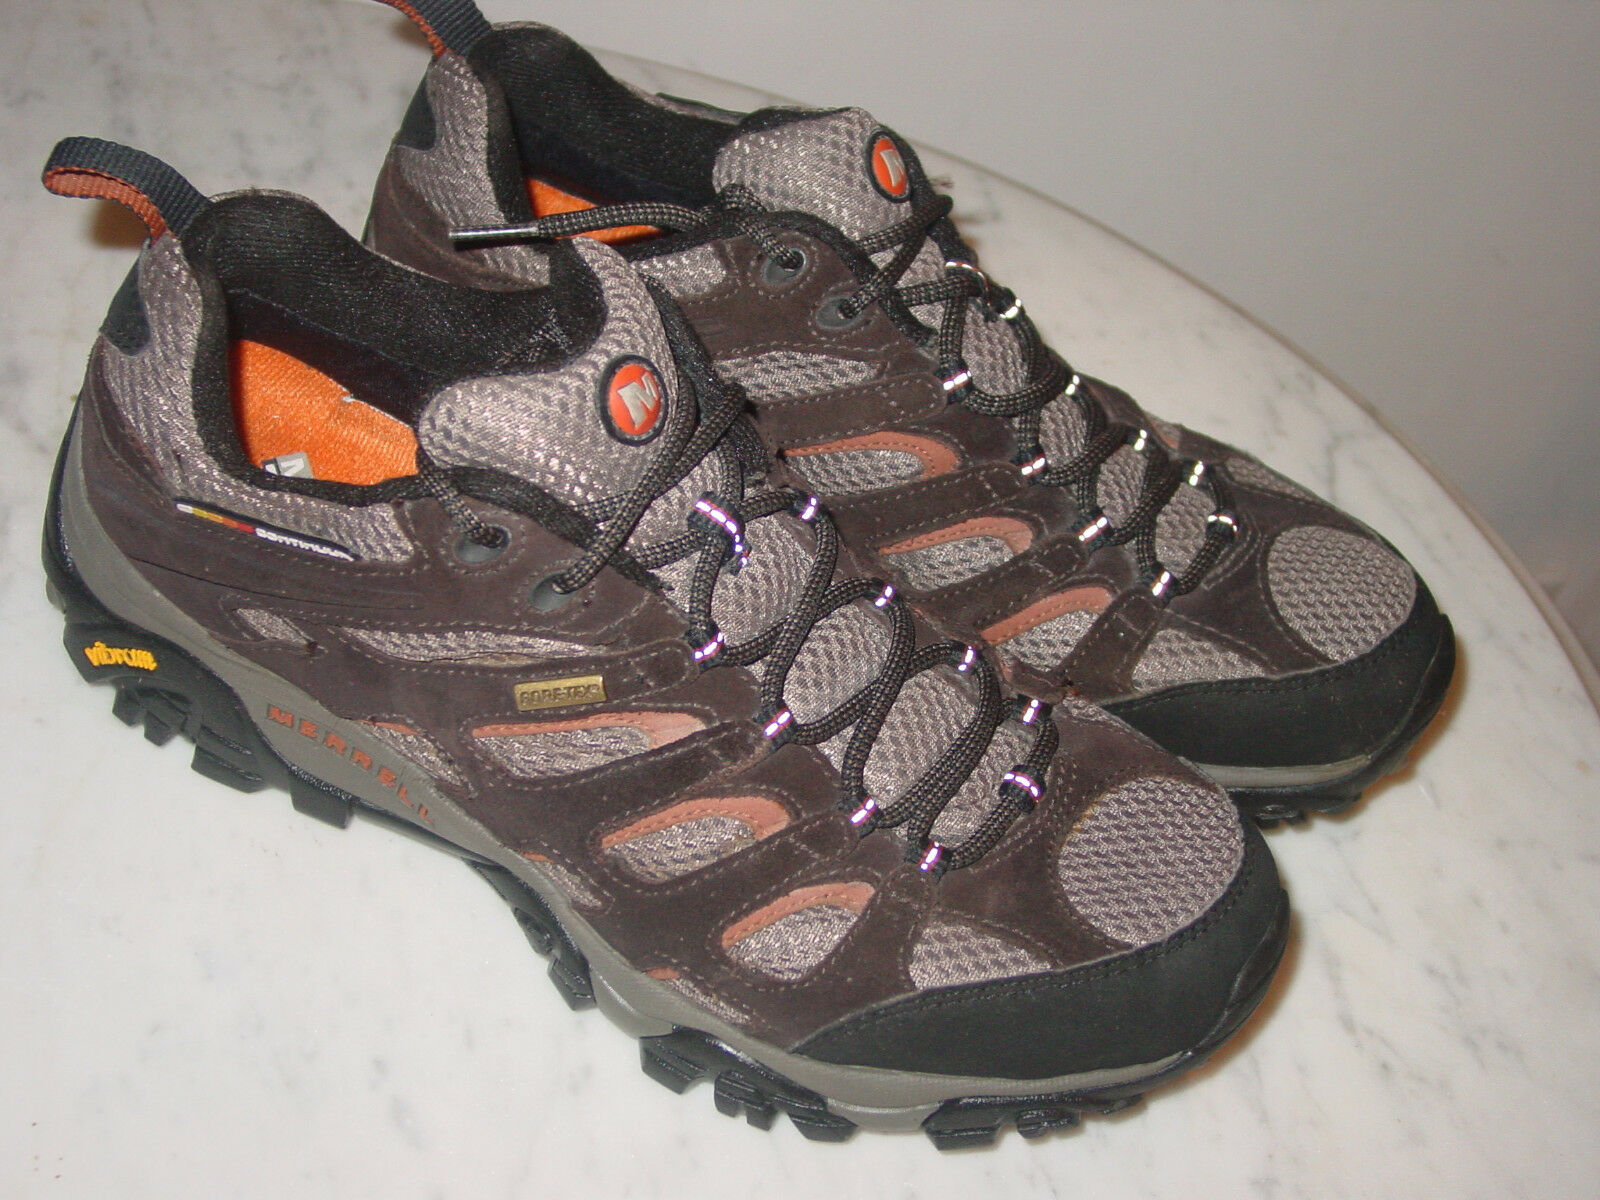 Mens Merrell Moab XCR GTX Ventilator J86905 Espersso Trail Hiking shoes  Size 9